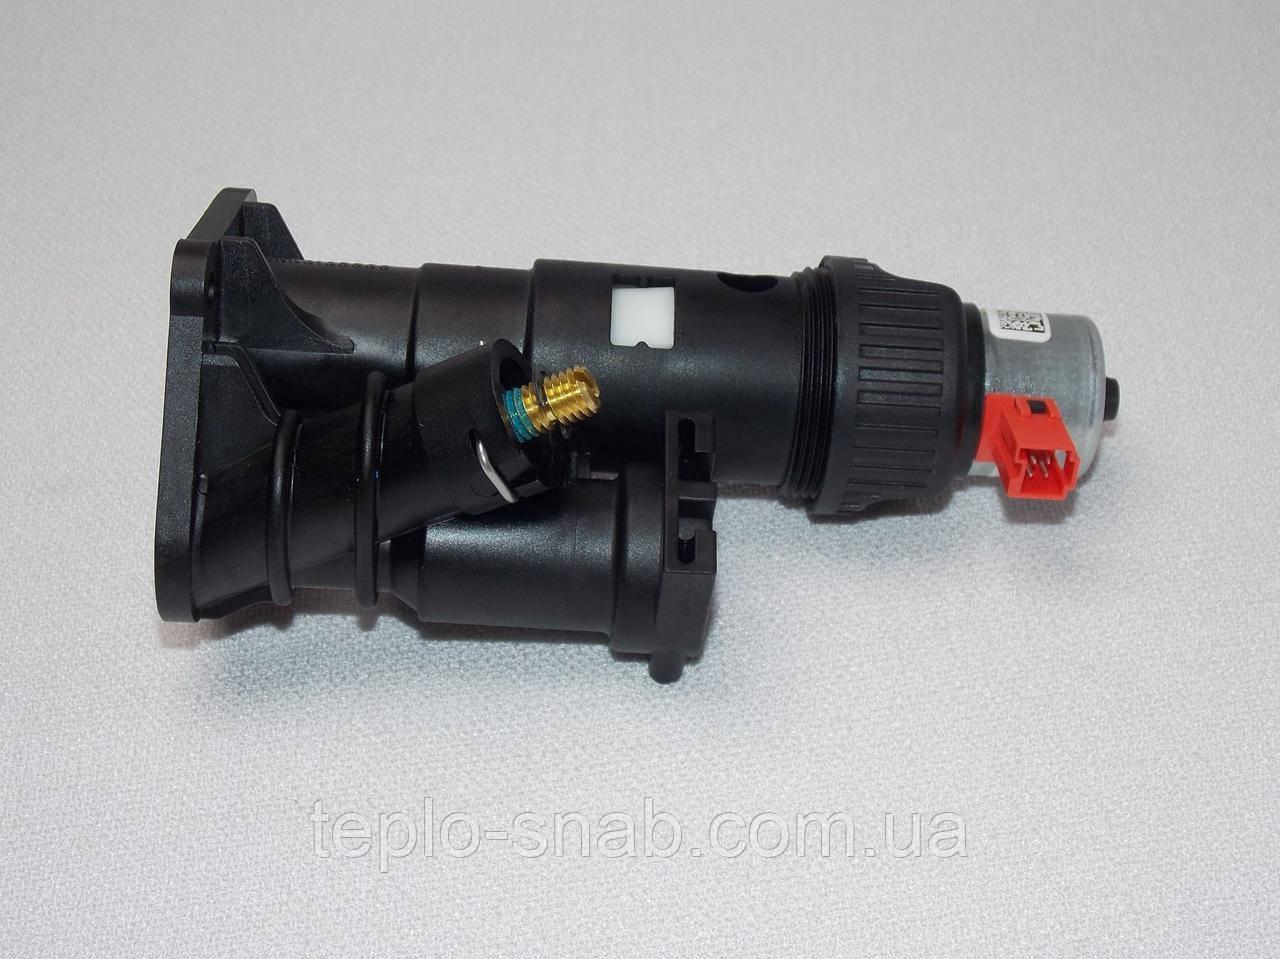 3-х ходовой клапан Protherm Panther v18. 178978, 0020014168 (0020020015)